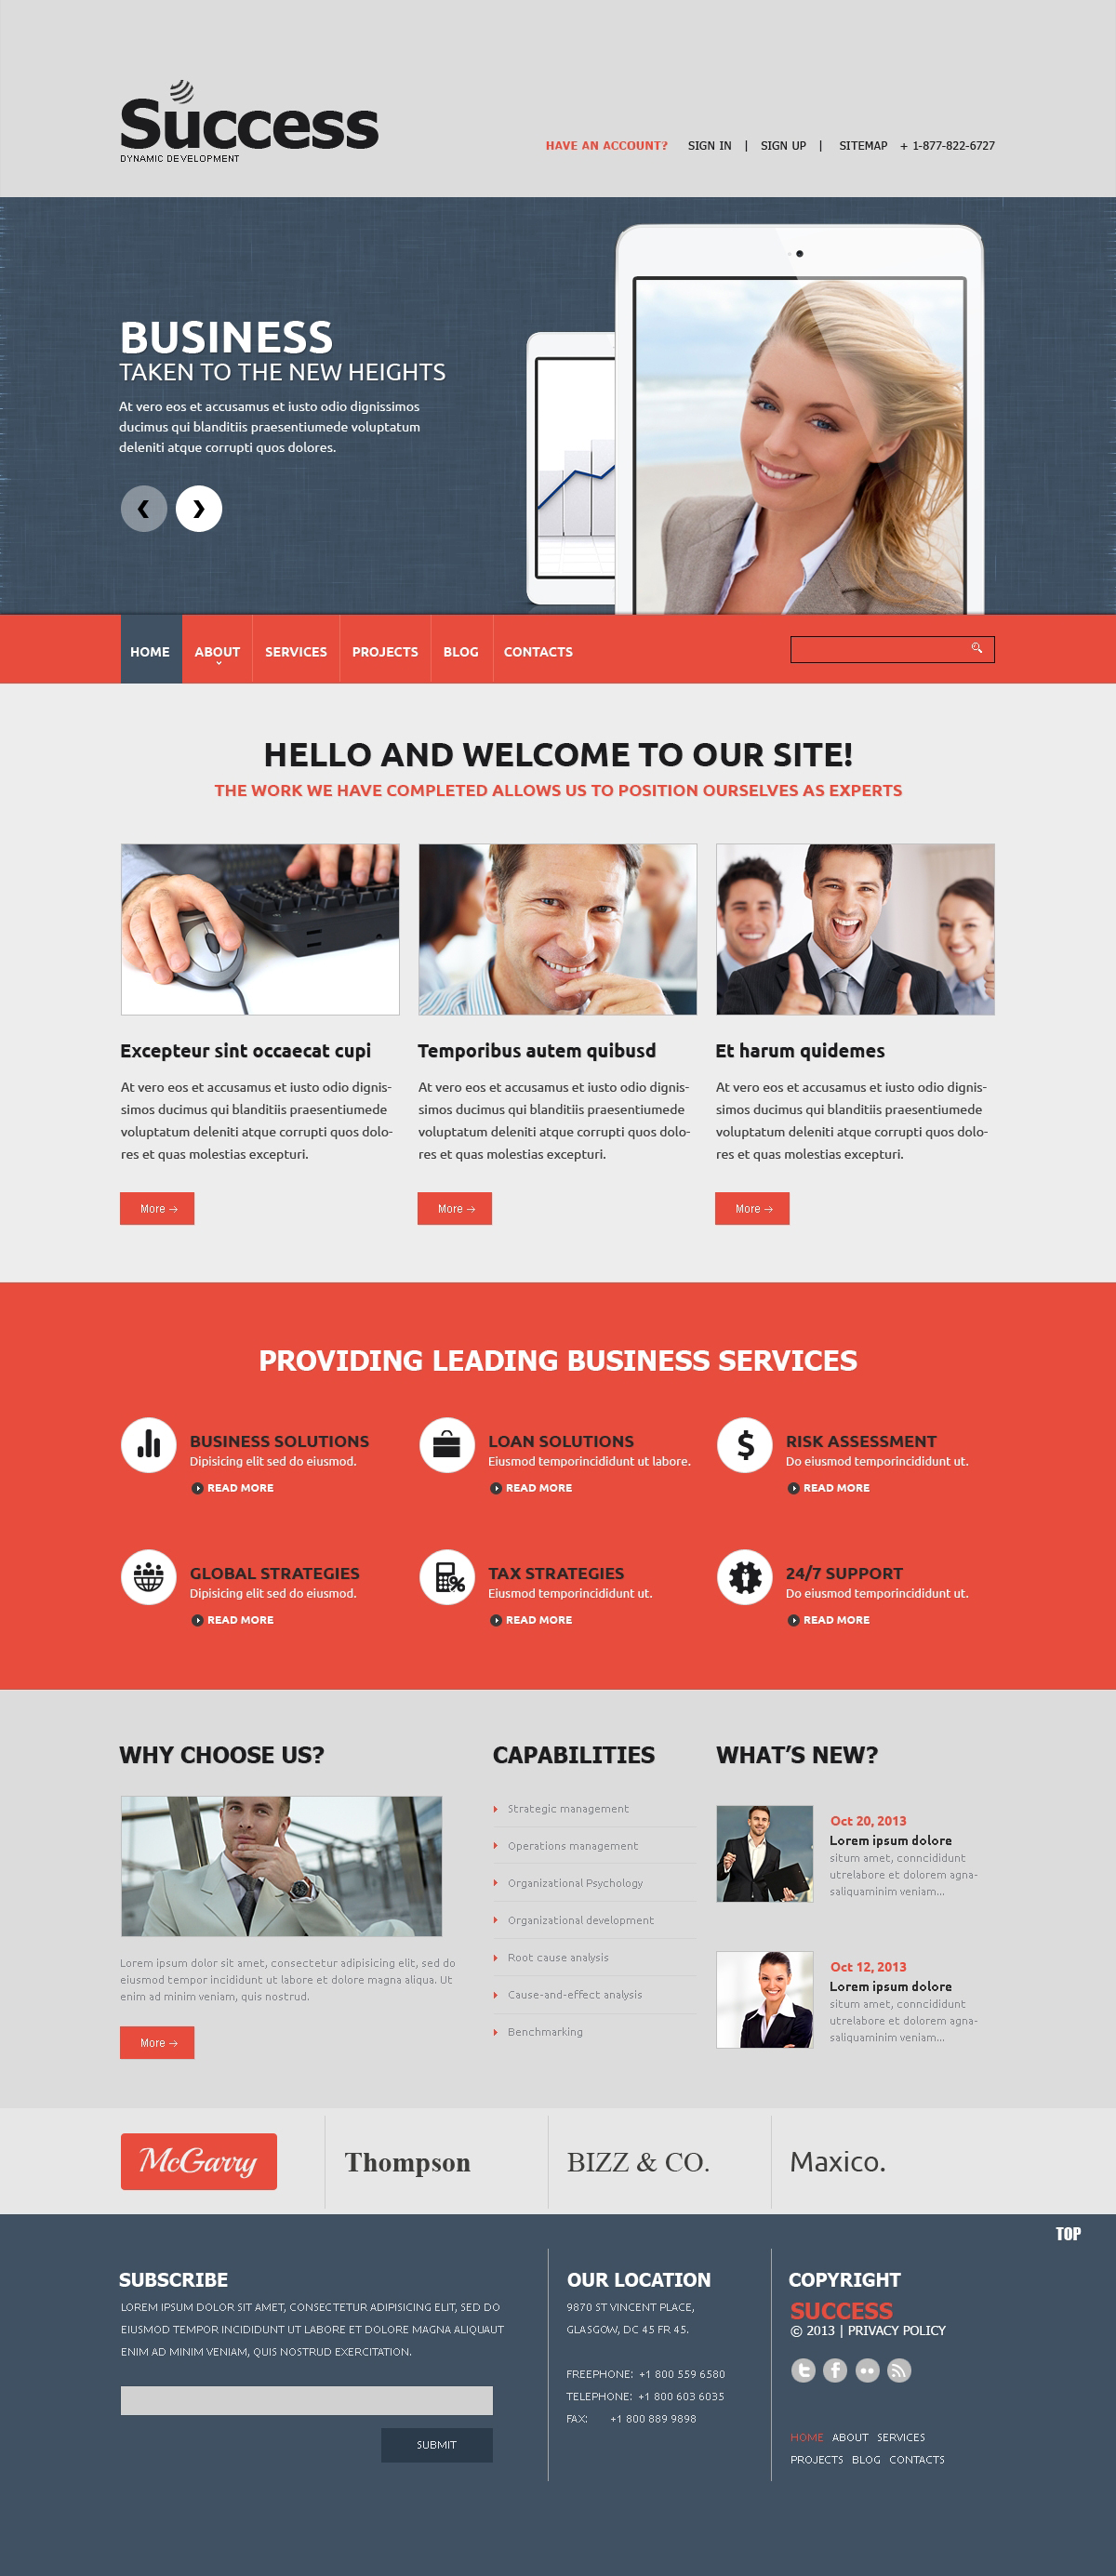 Marketing Agency Website Templates | TemplateMonster